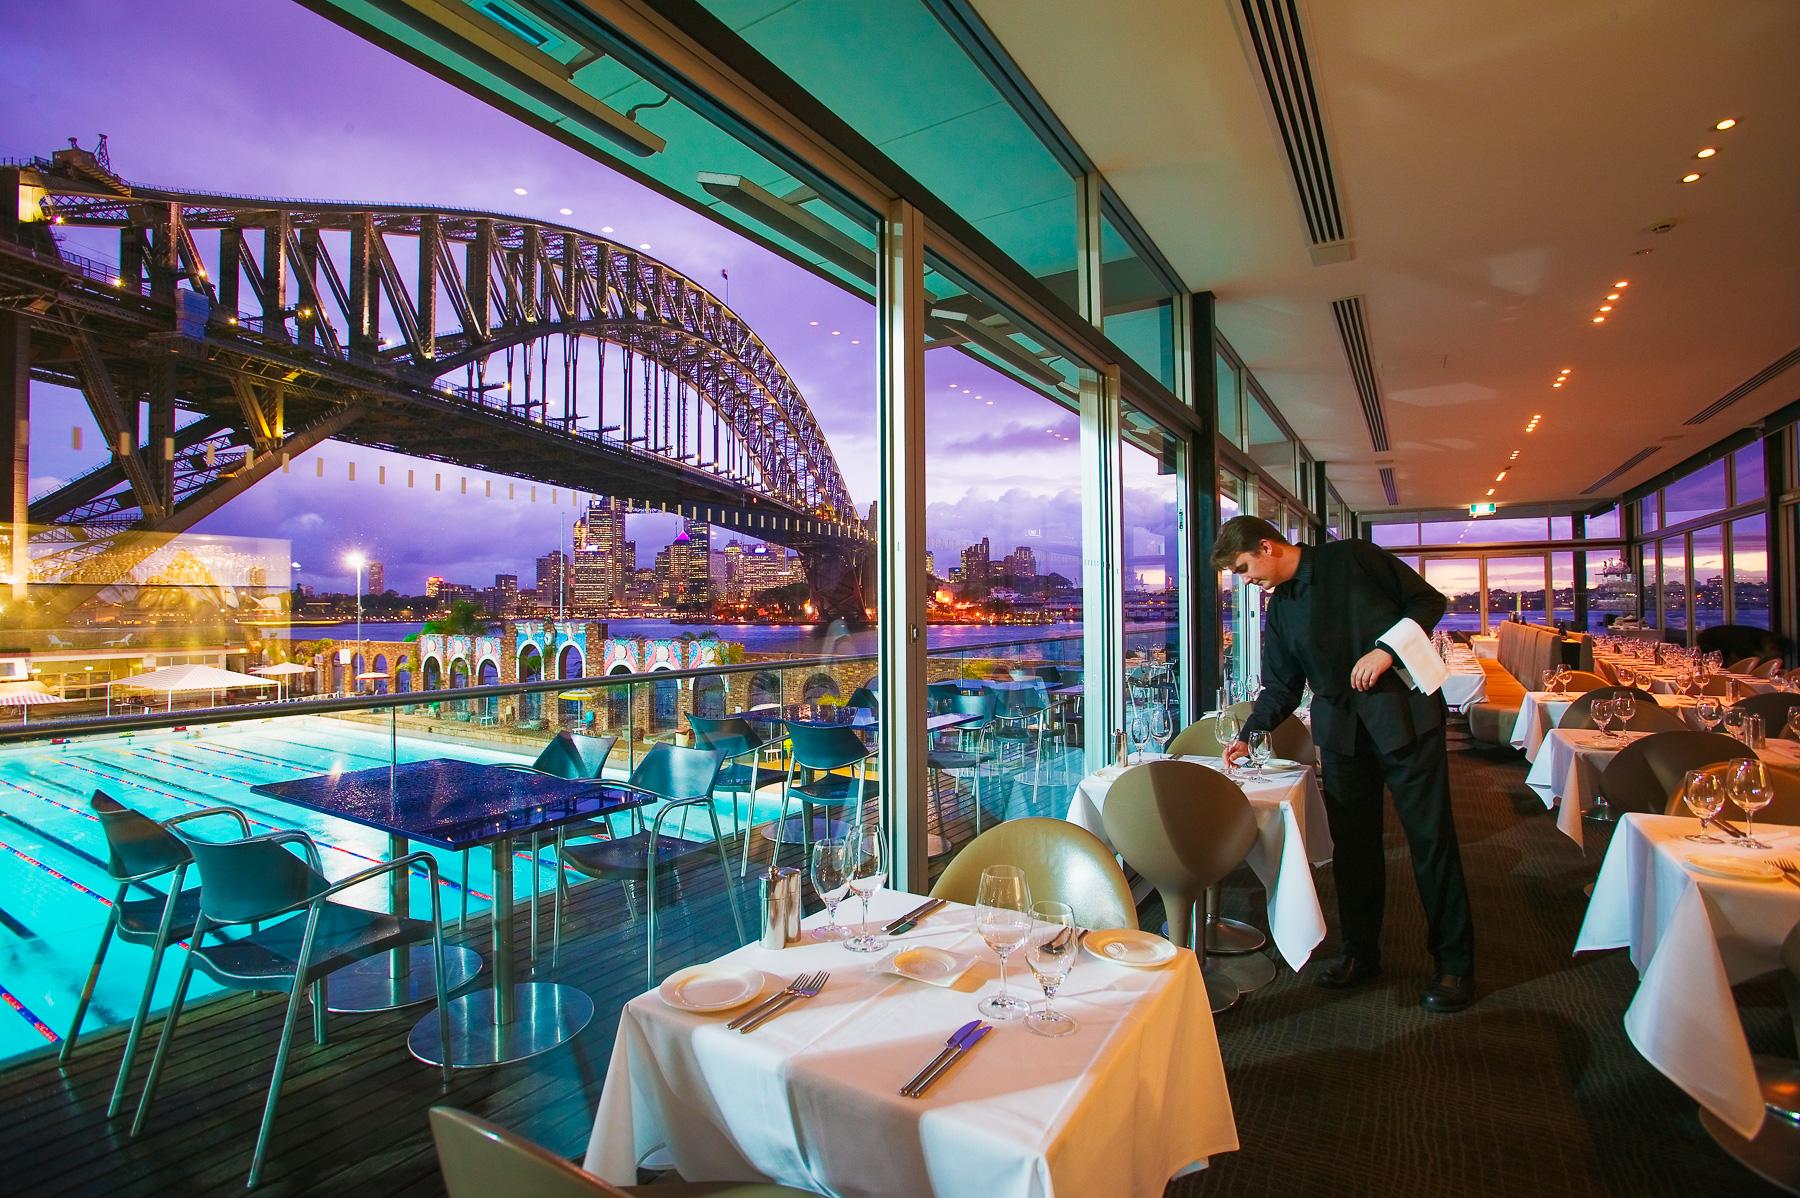 Aqua Dining restaurant at Milsons Point, overlooking Luna Park, North Sydney Pool and the Sydney Harbour Bridge.